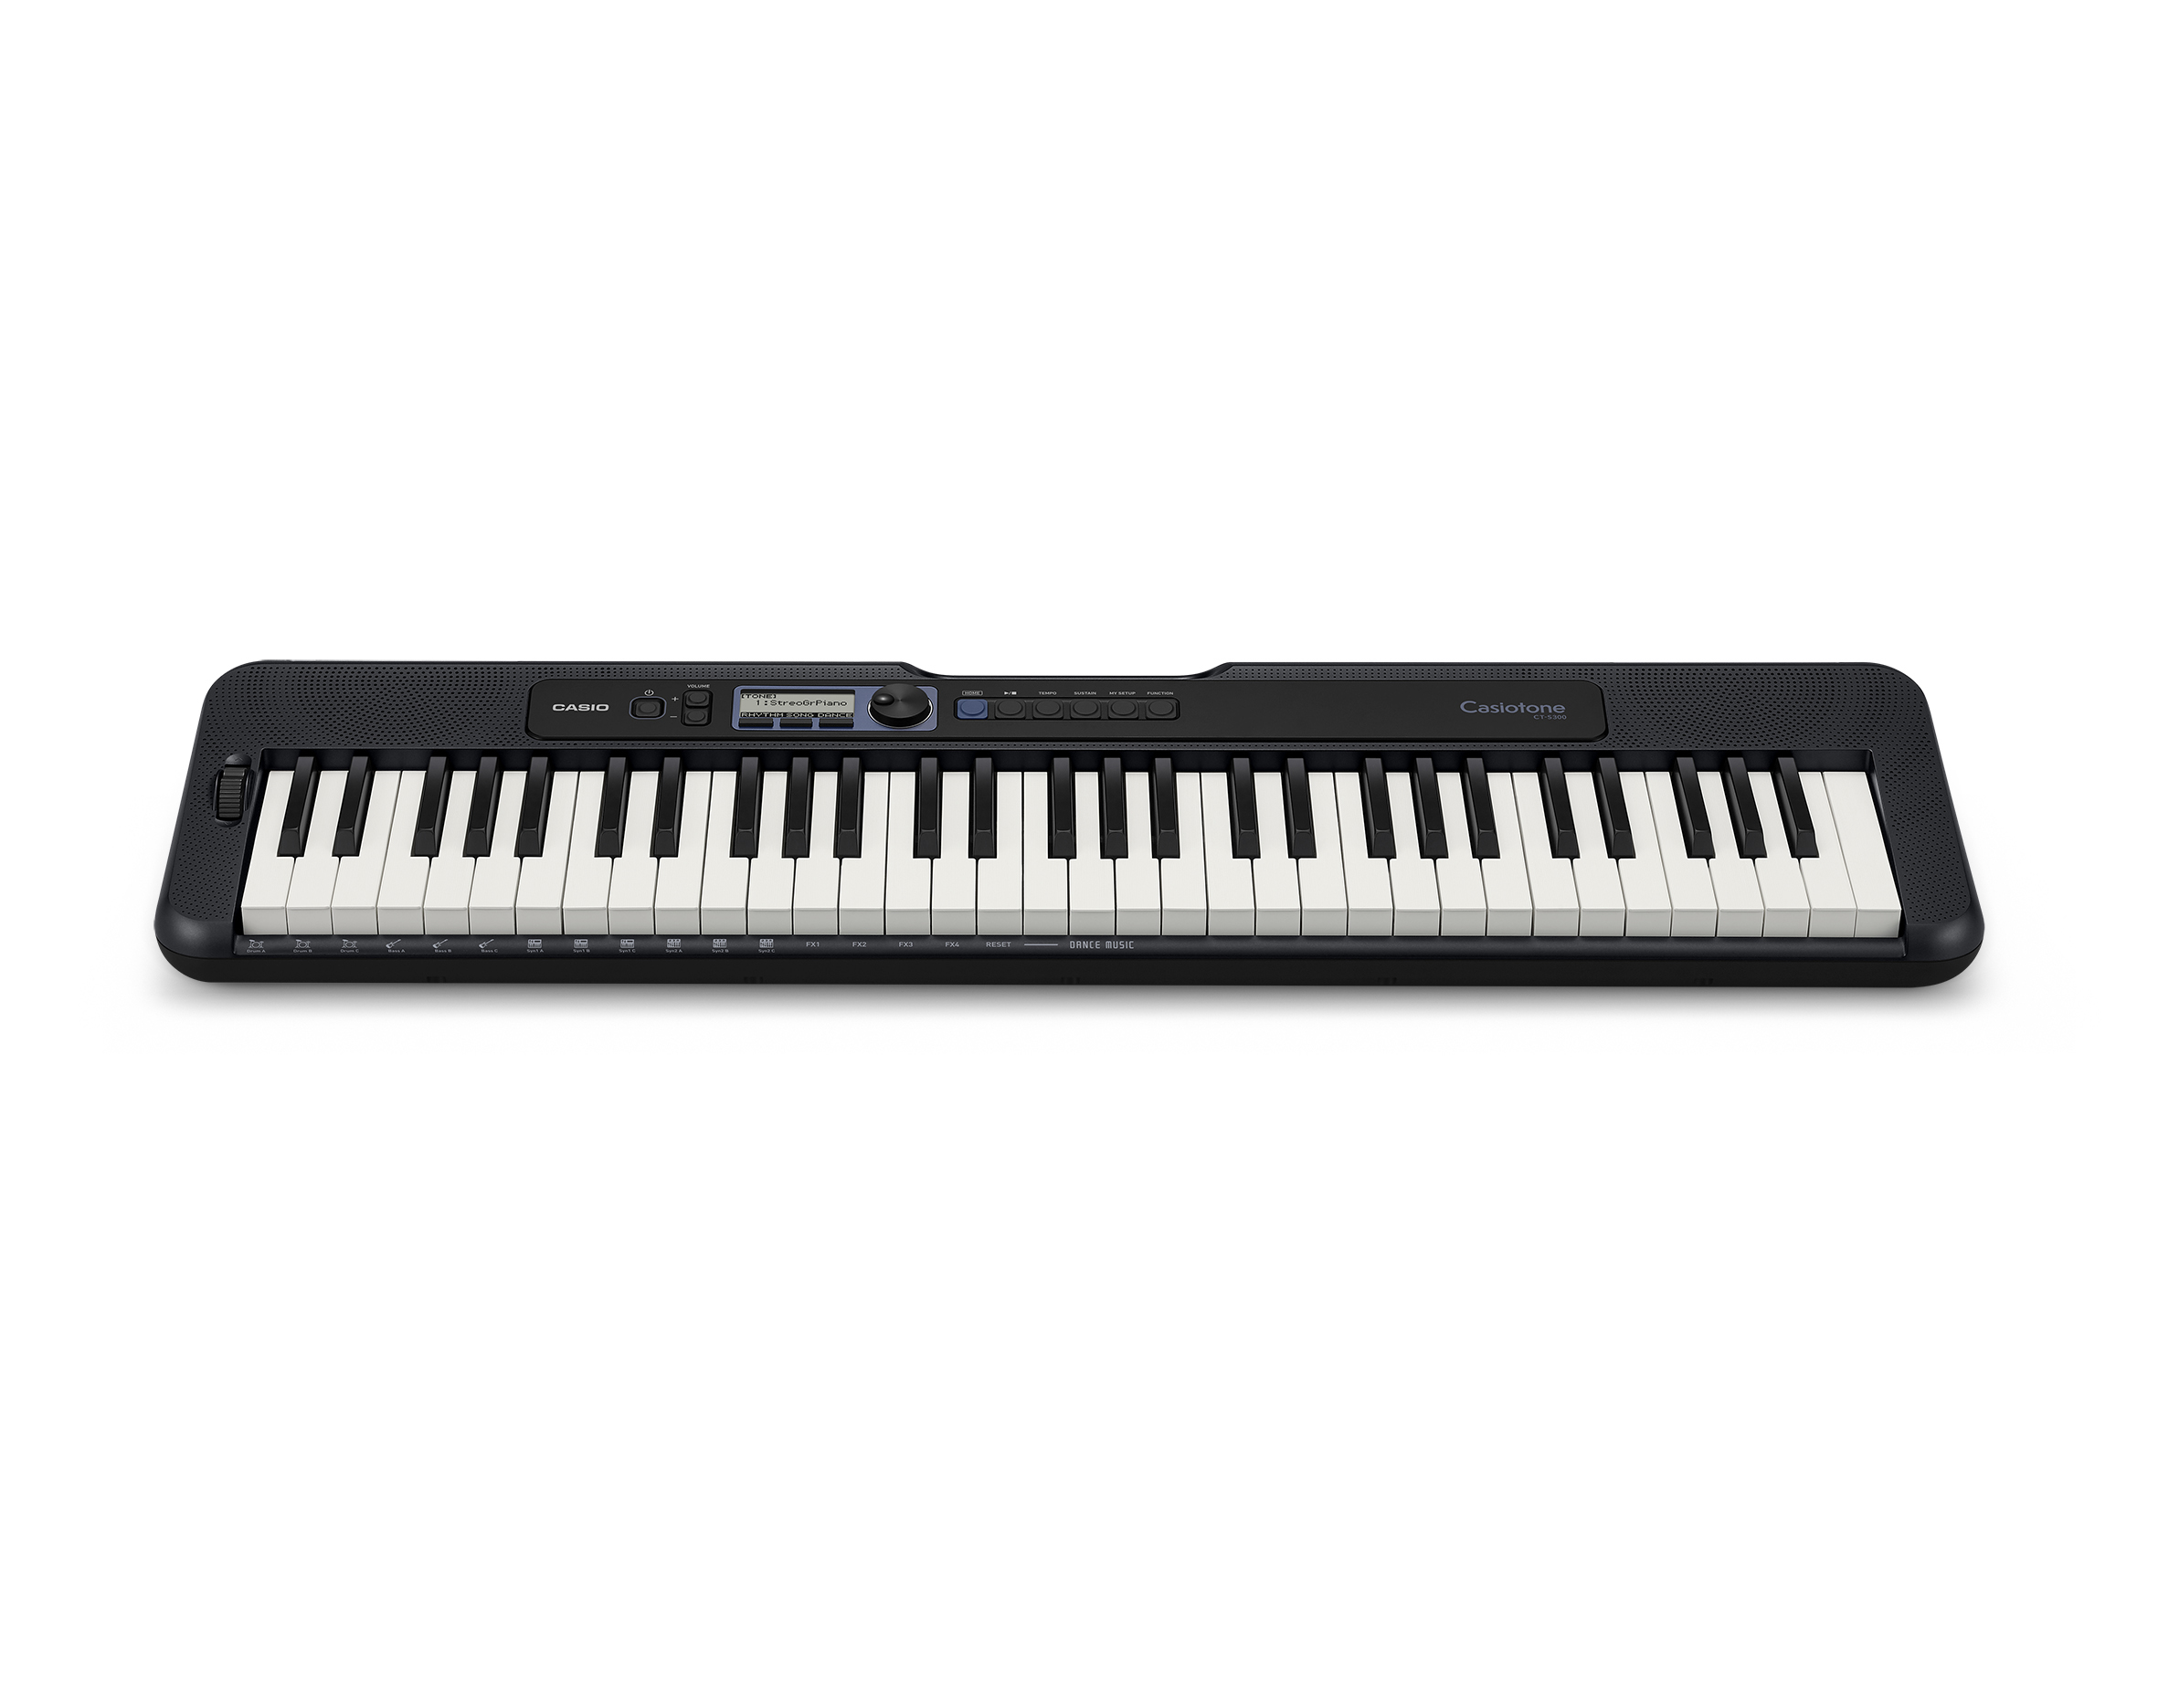 Casio CT-S300 Anslagskänsligt Keyboard